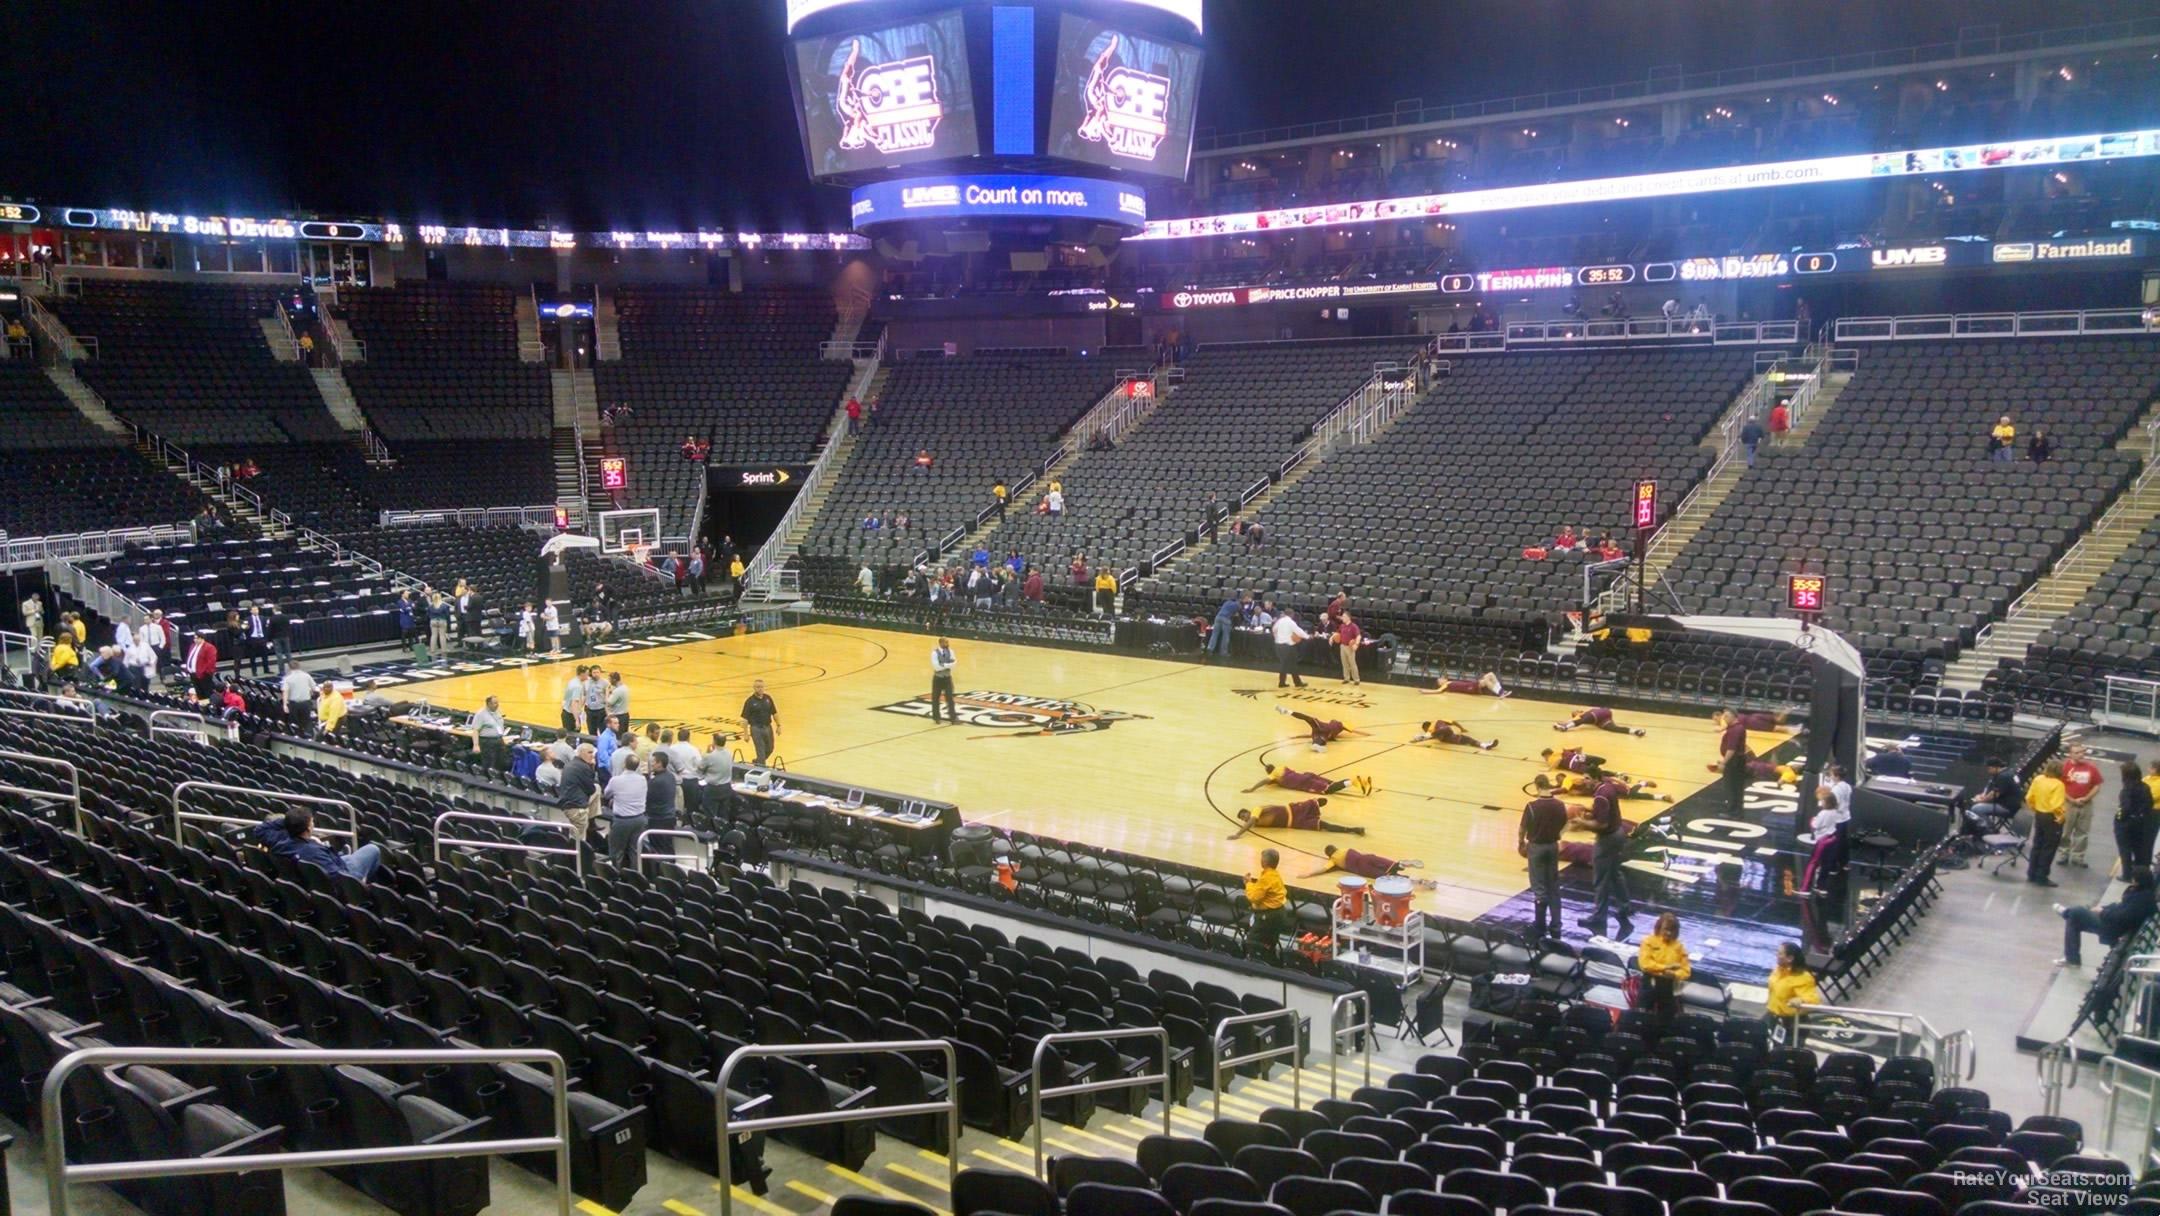 Sprint Center Kansas City Basketball Seating